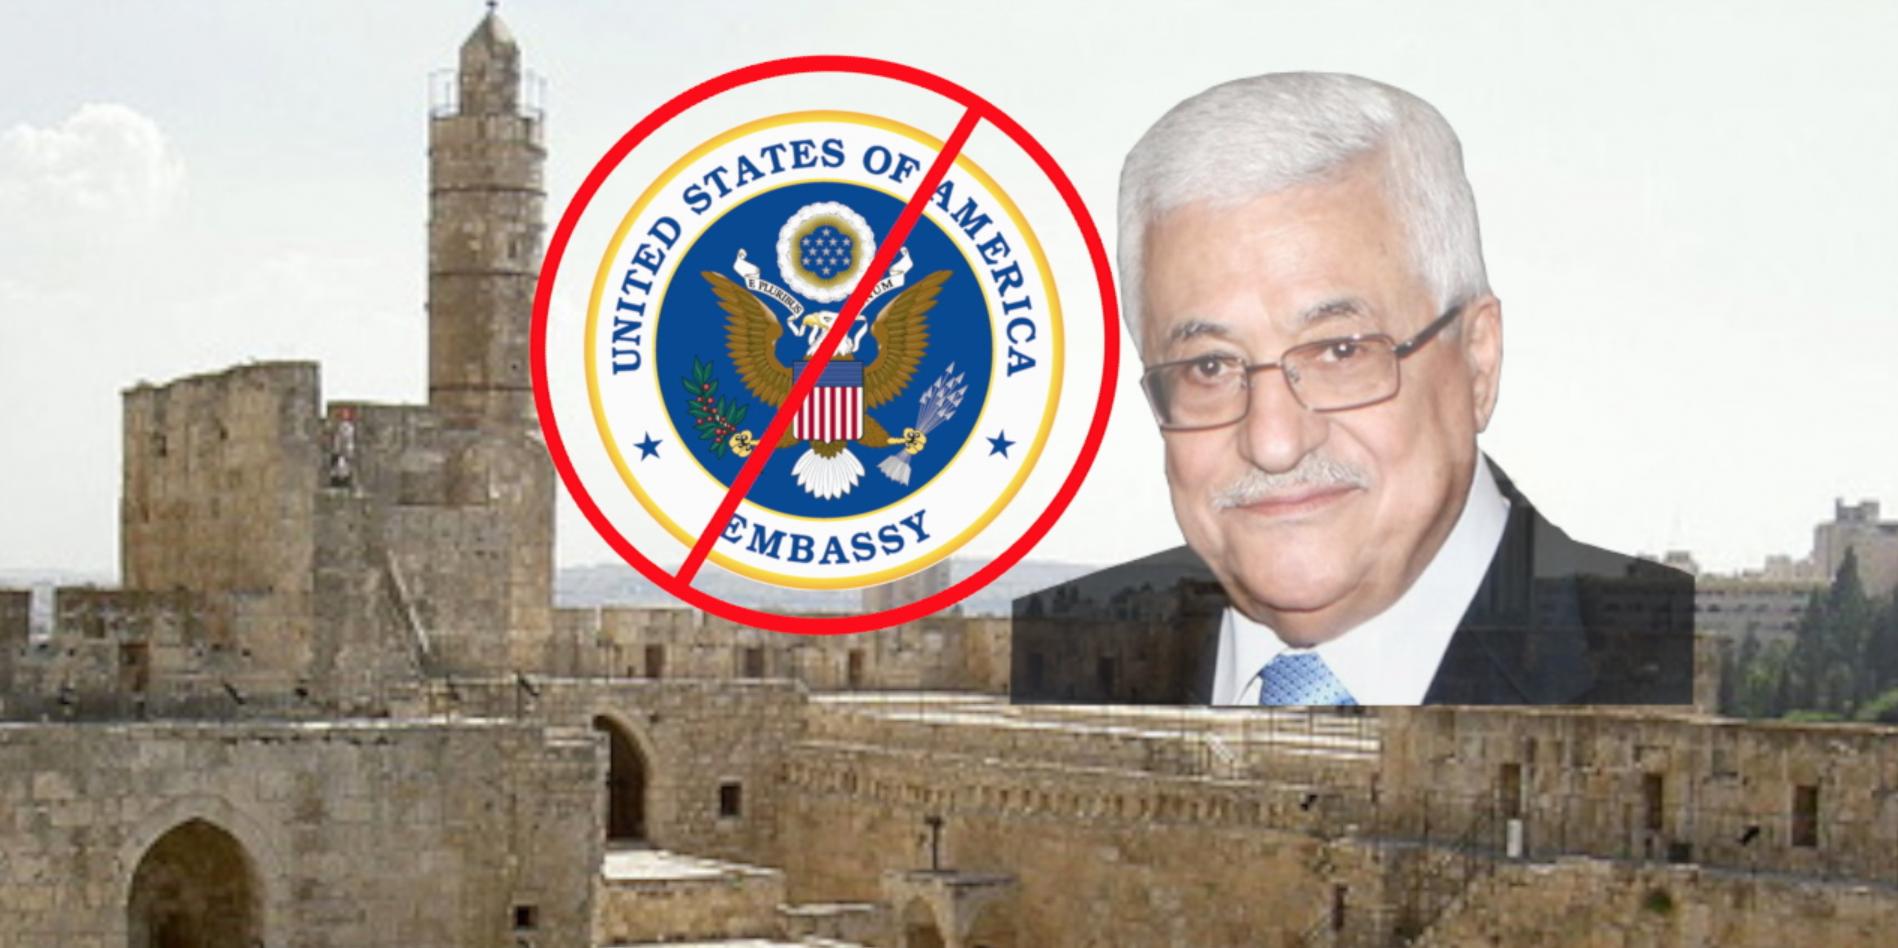 Abbas Won't Allow Embassy Move